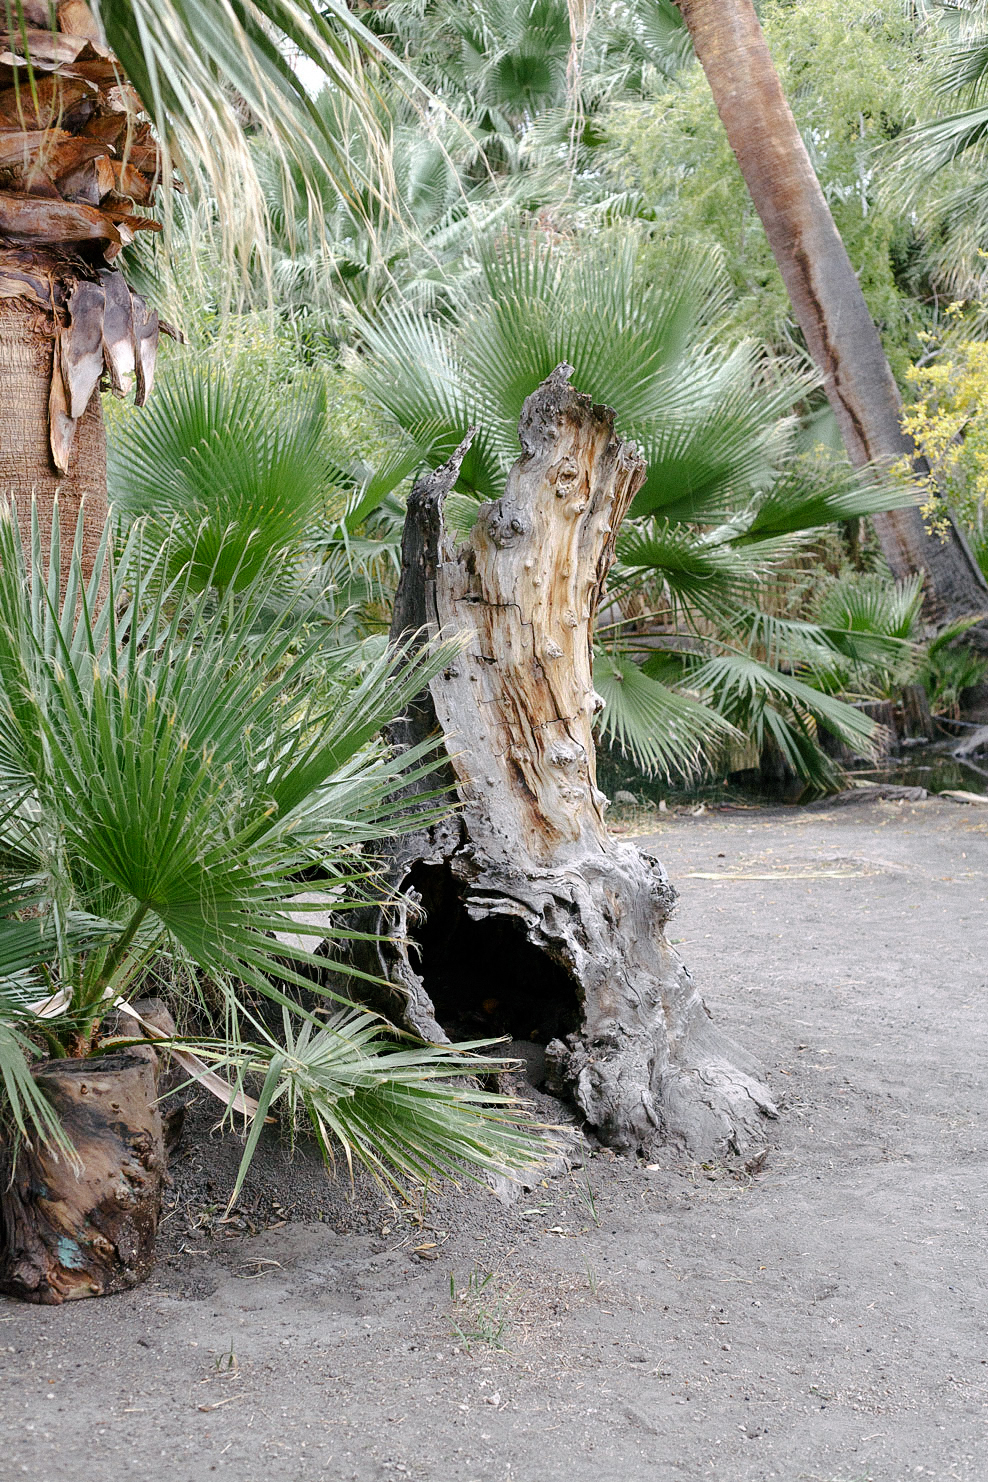 Freunde-von-Freunden-Joshua-Tree-park-desert-trip-claire-cotrell-laurence-spencer-king-013b3